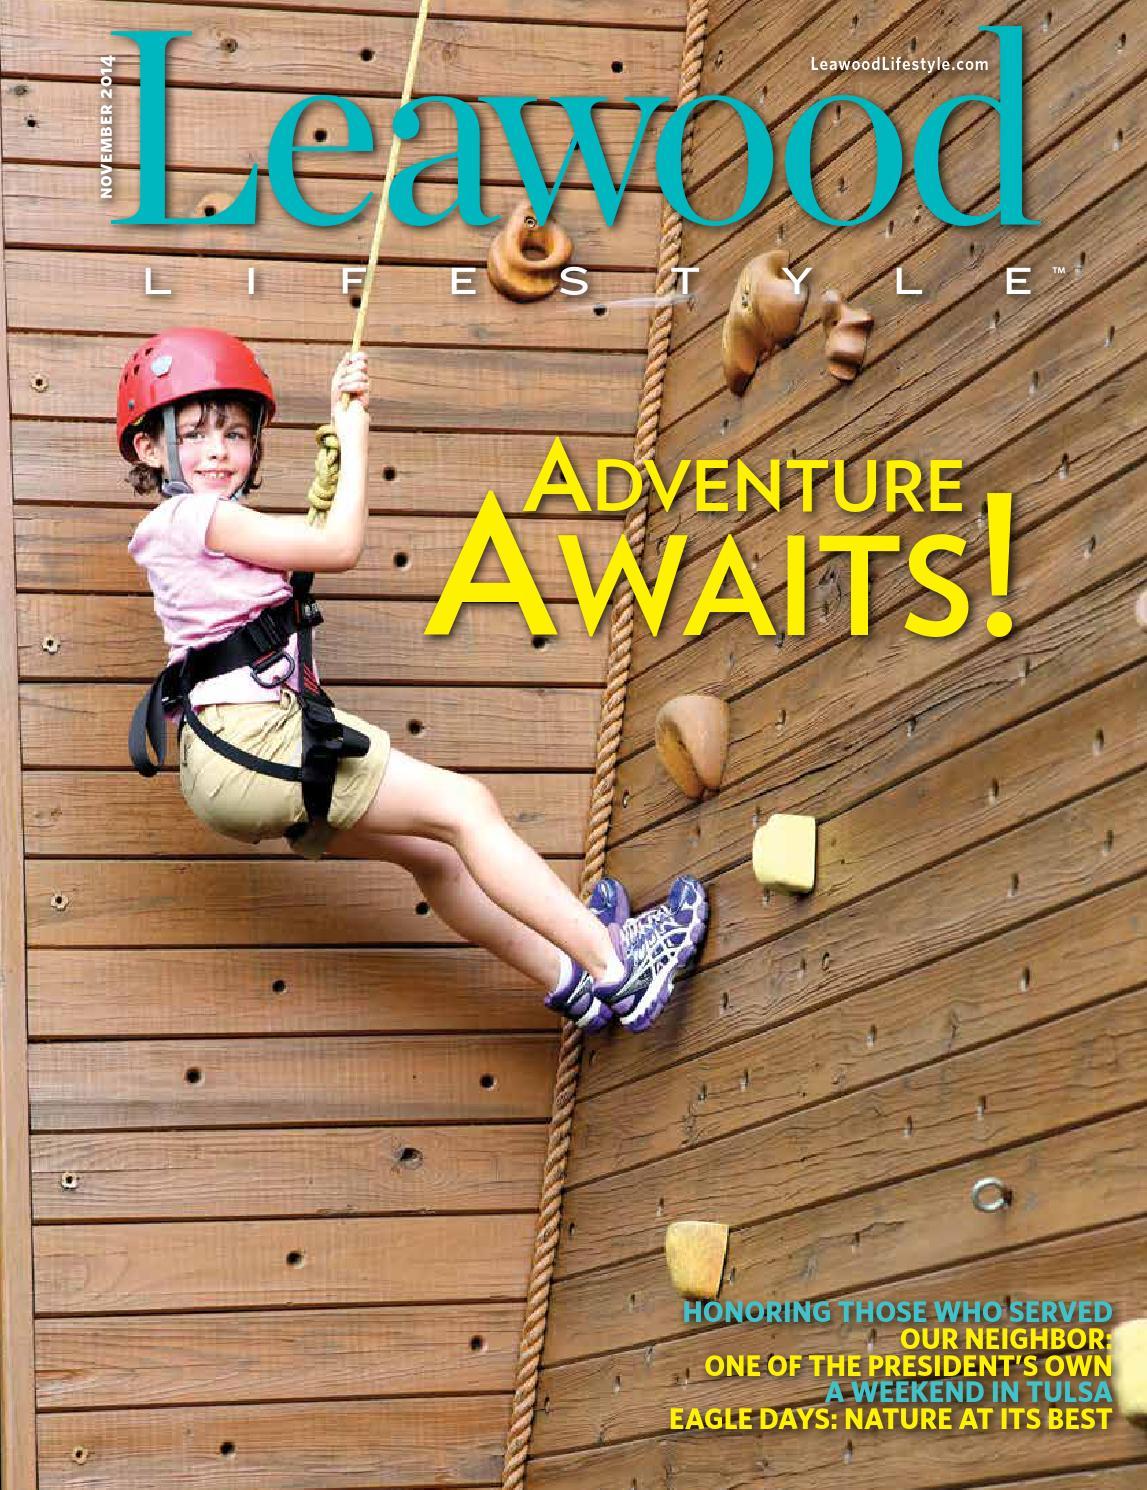 Leawood Lifestyle November 2014 by Lifestyle Publications - issuu